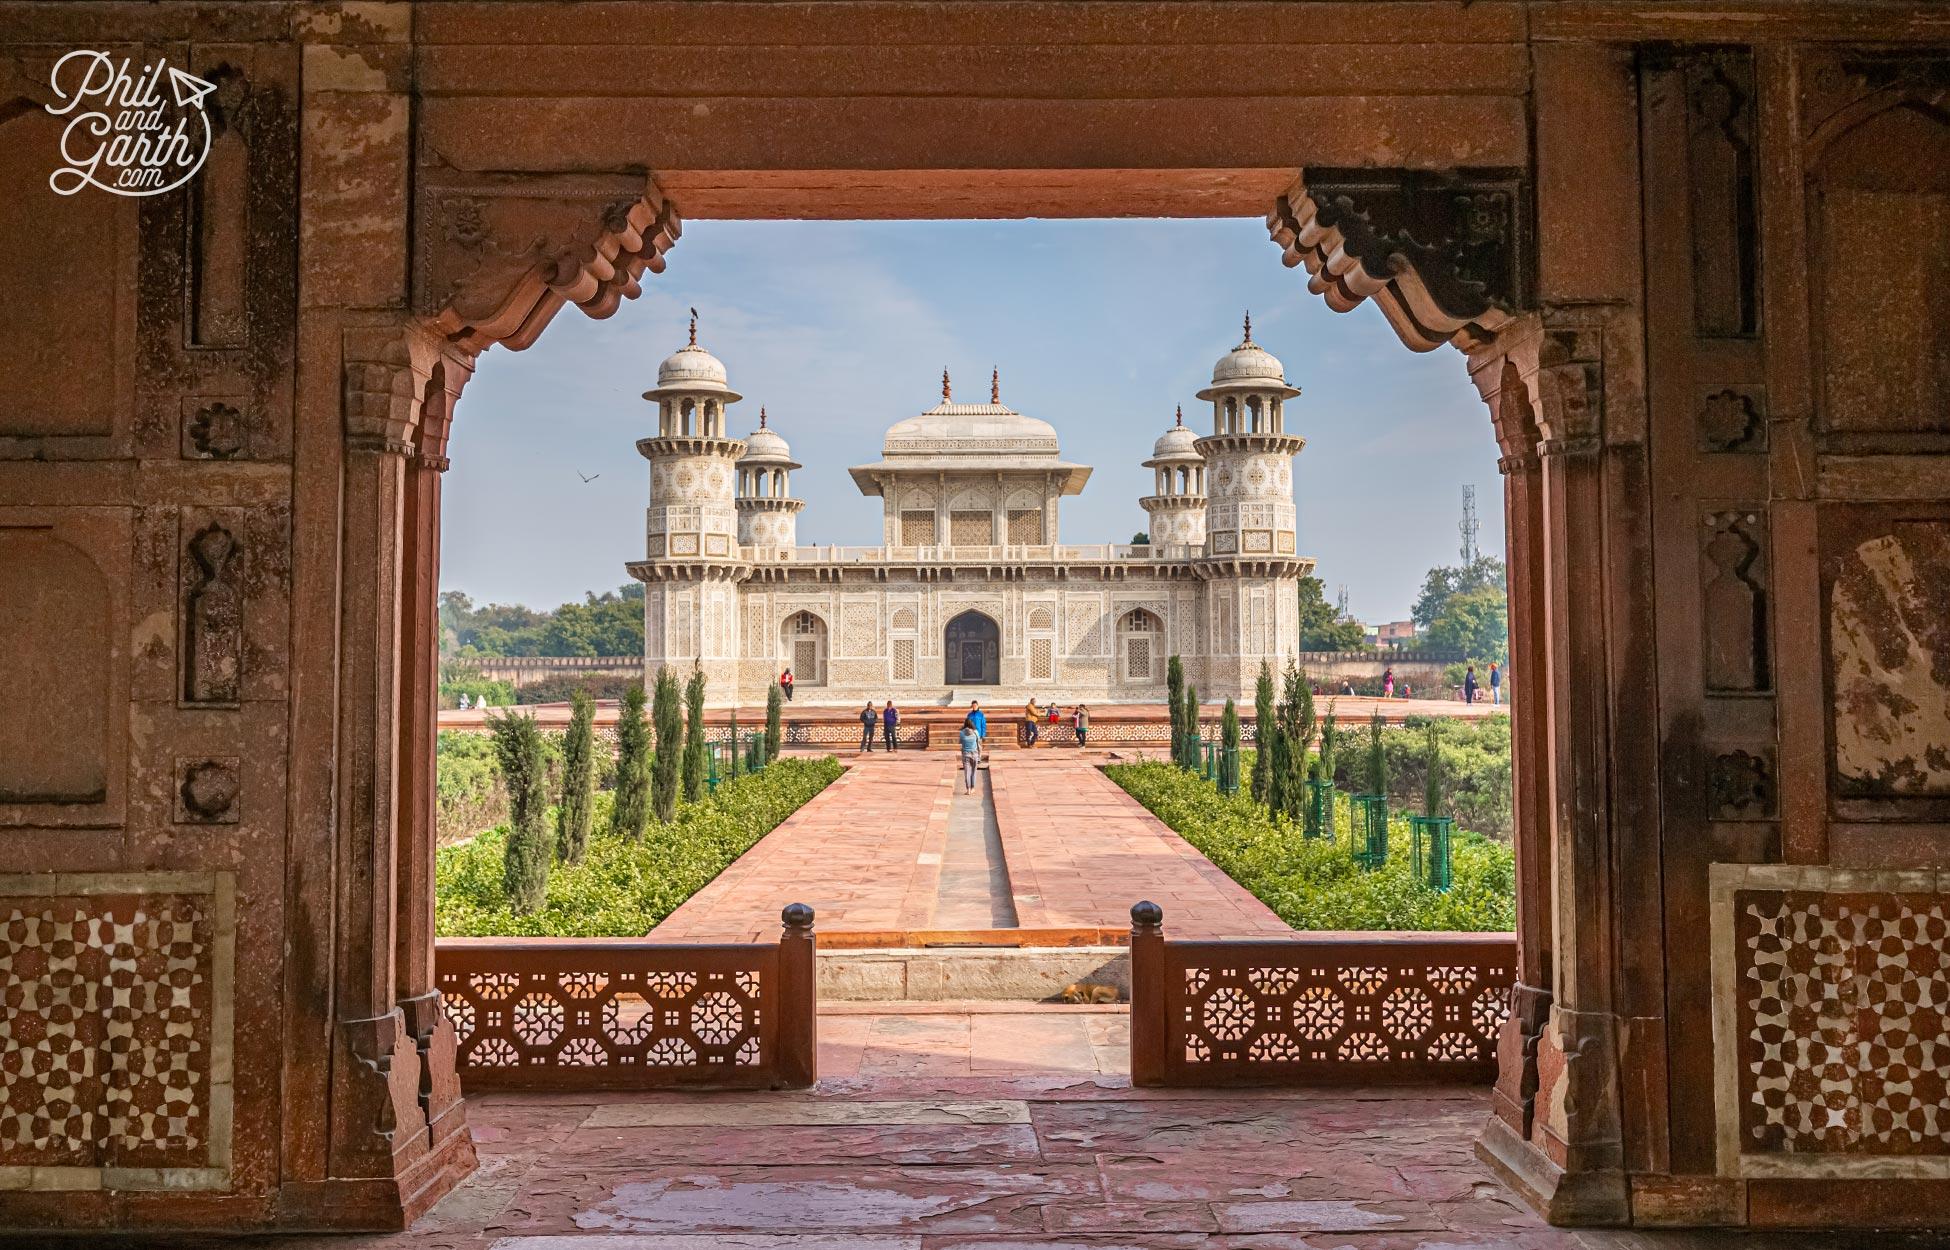 The mausoleum of I'timād-ud-Daulah also known as 'The Baby Taj'